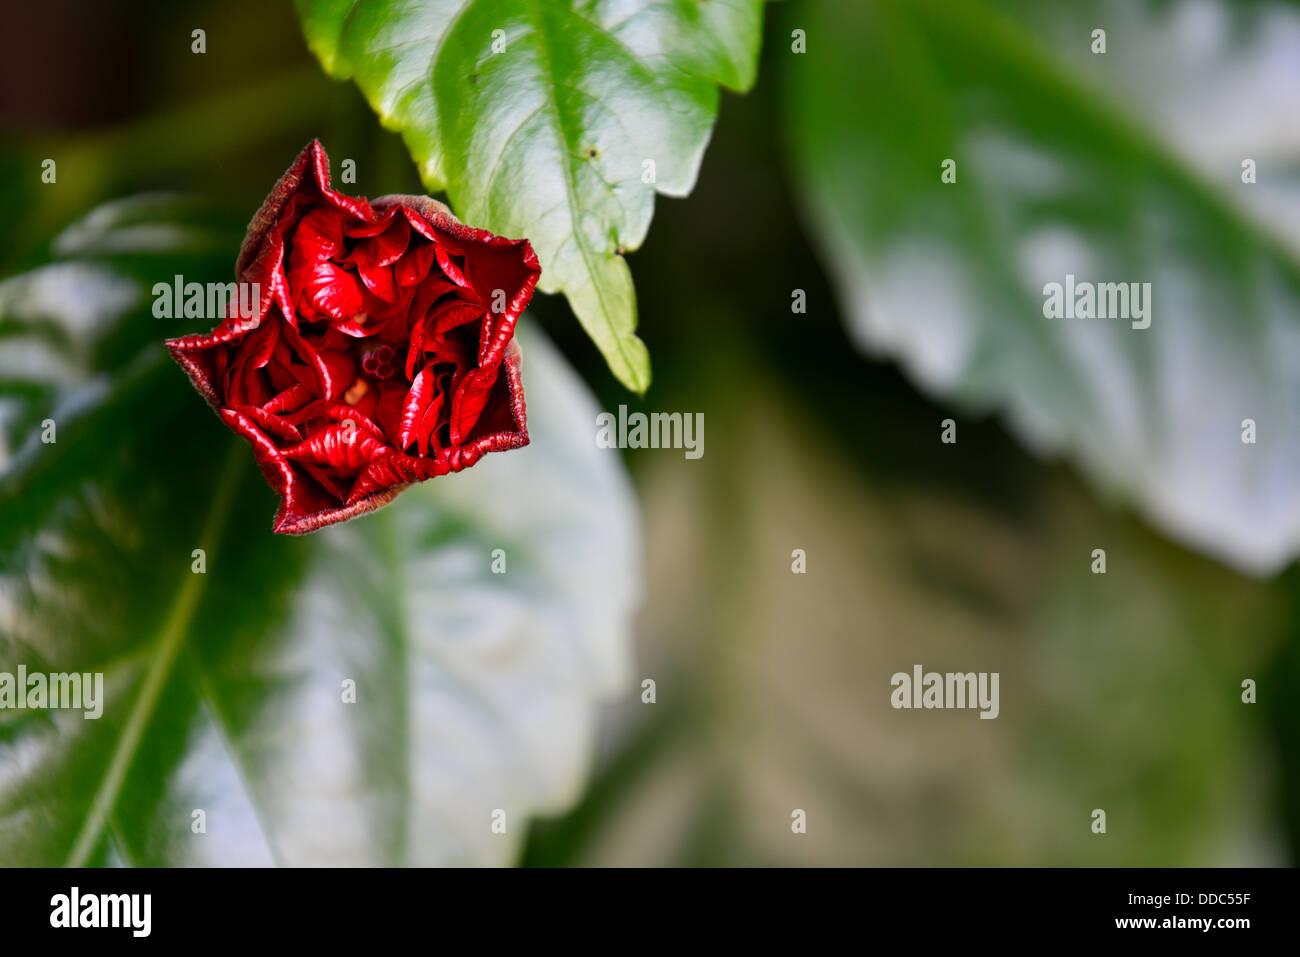 Flower bud of the red rose of sudan hibiscus stock photo 59889131 flower bud of the red rose of sudan hibiscus izmirmasajfo